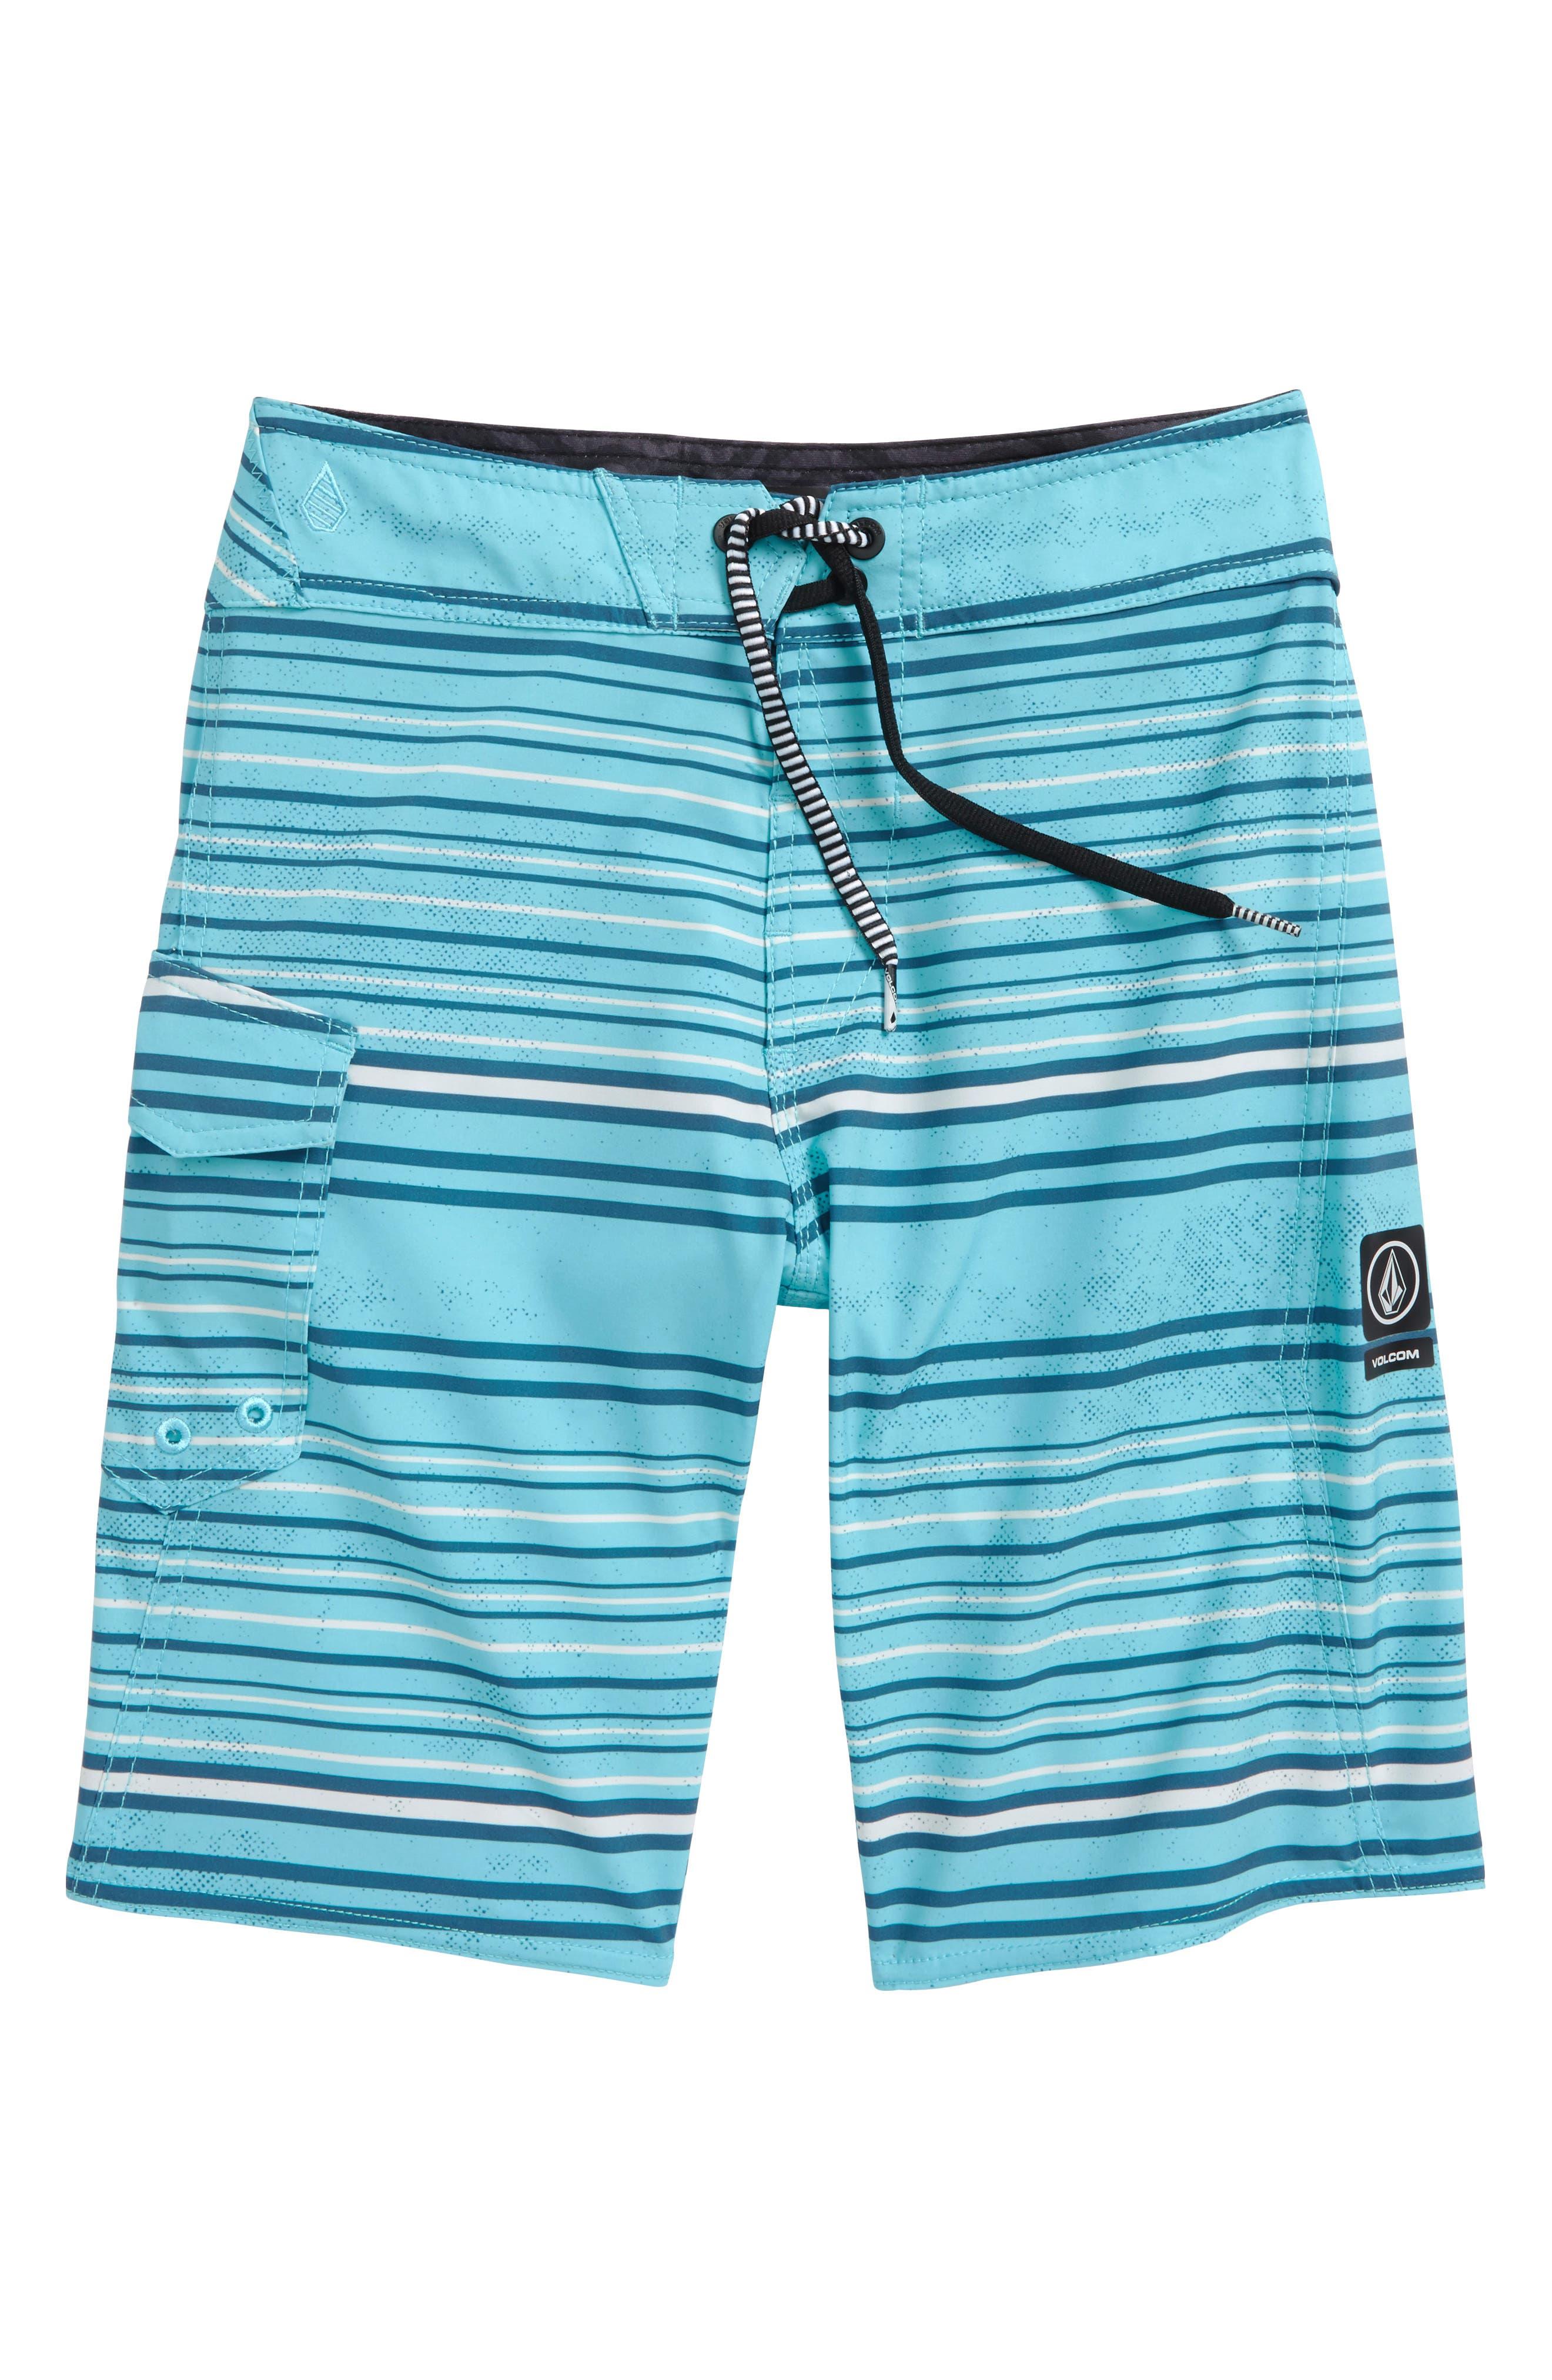 Magnetic Liney Board Shorts,                             Main thumbnail 1, color,                             440